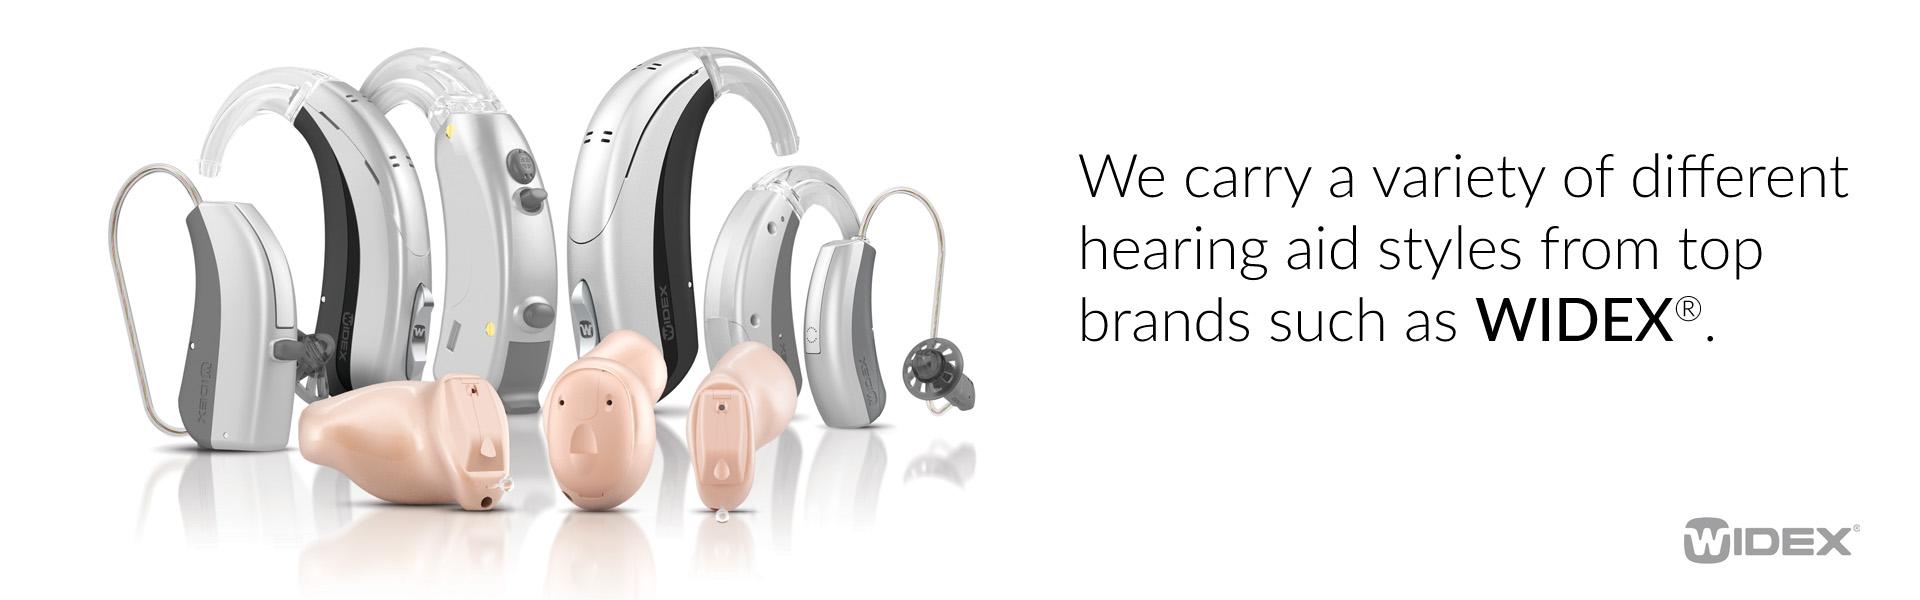 Widex Hearing Aid Paducah